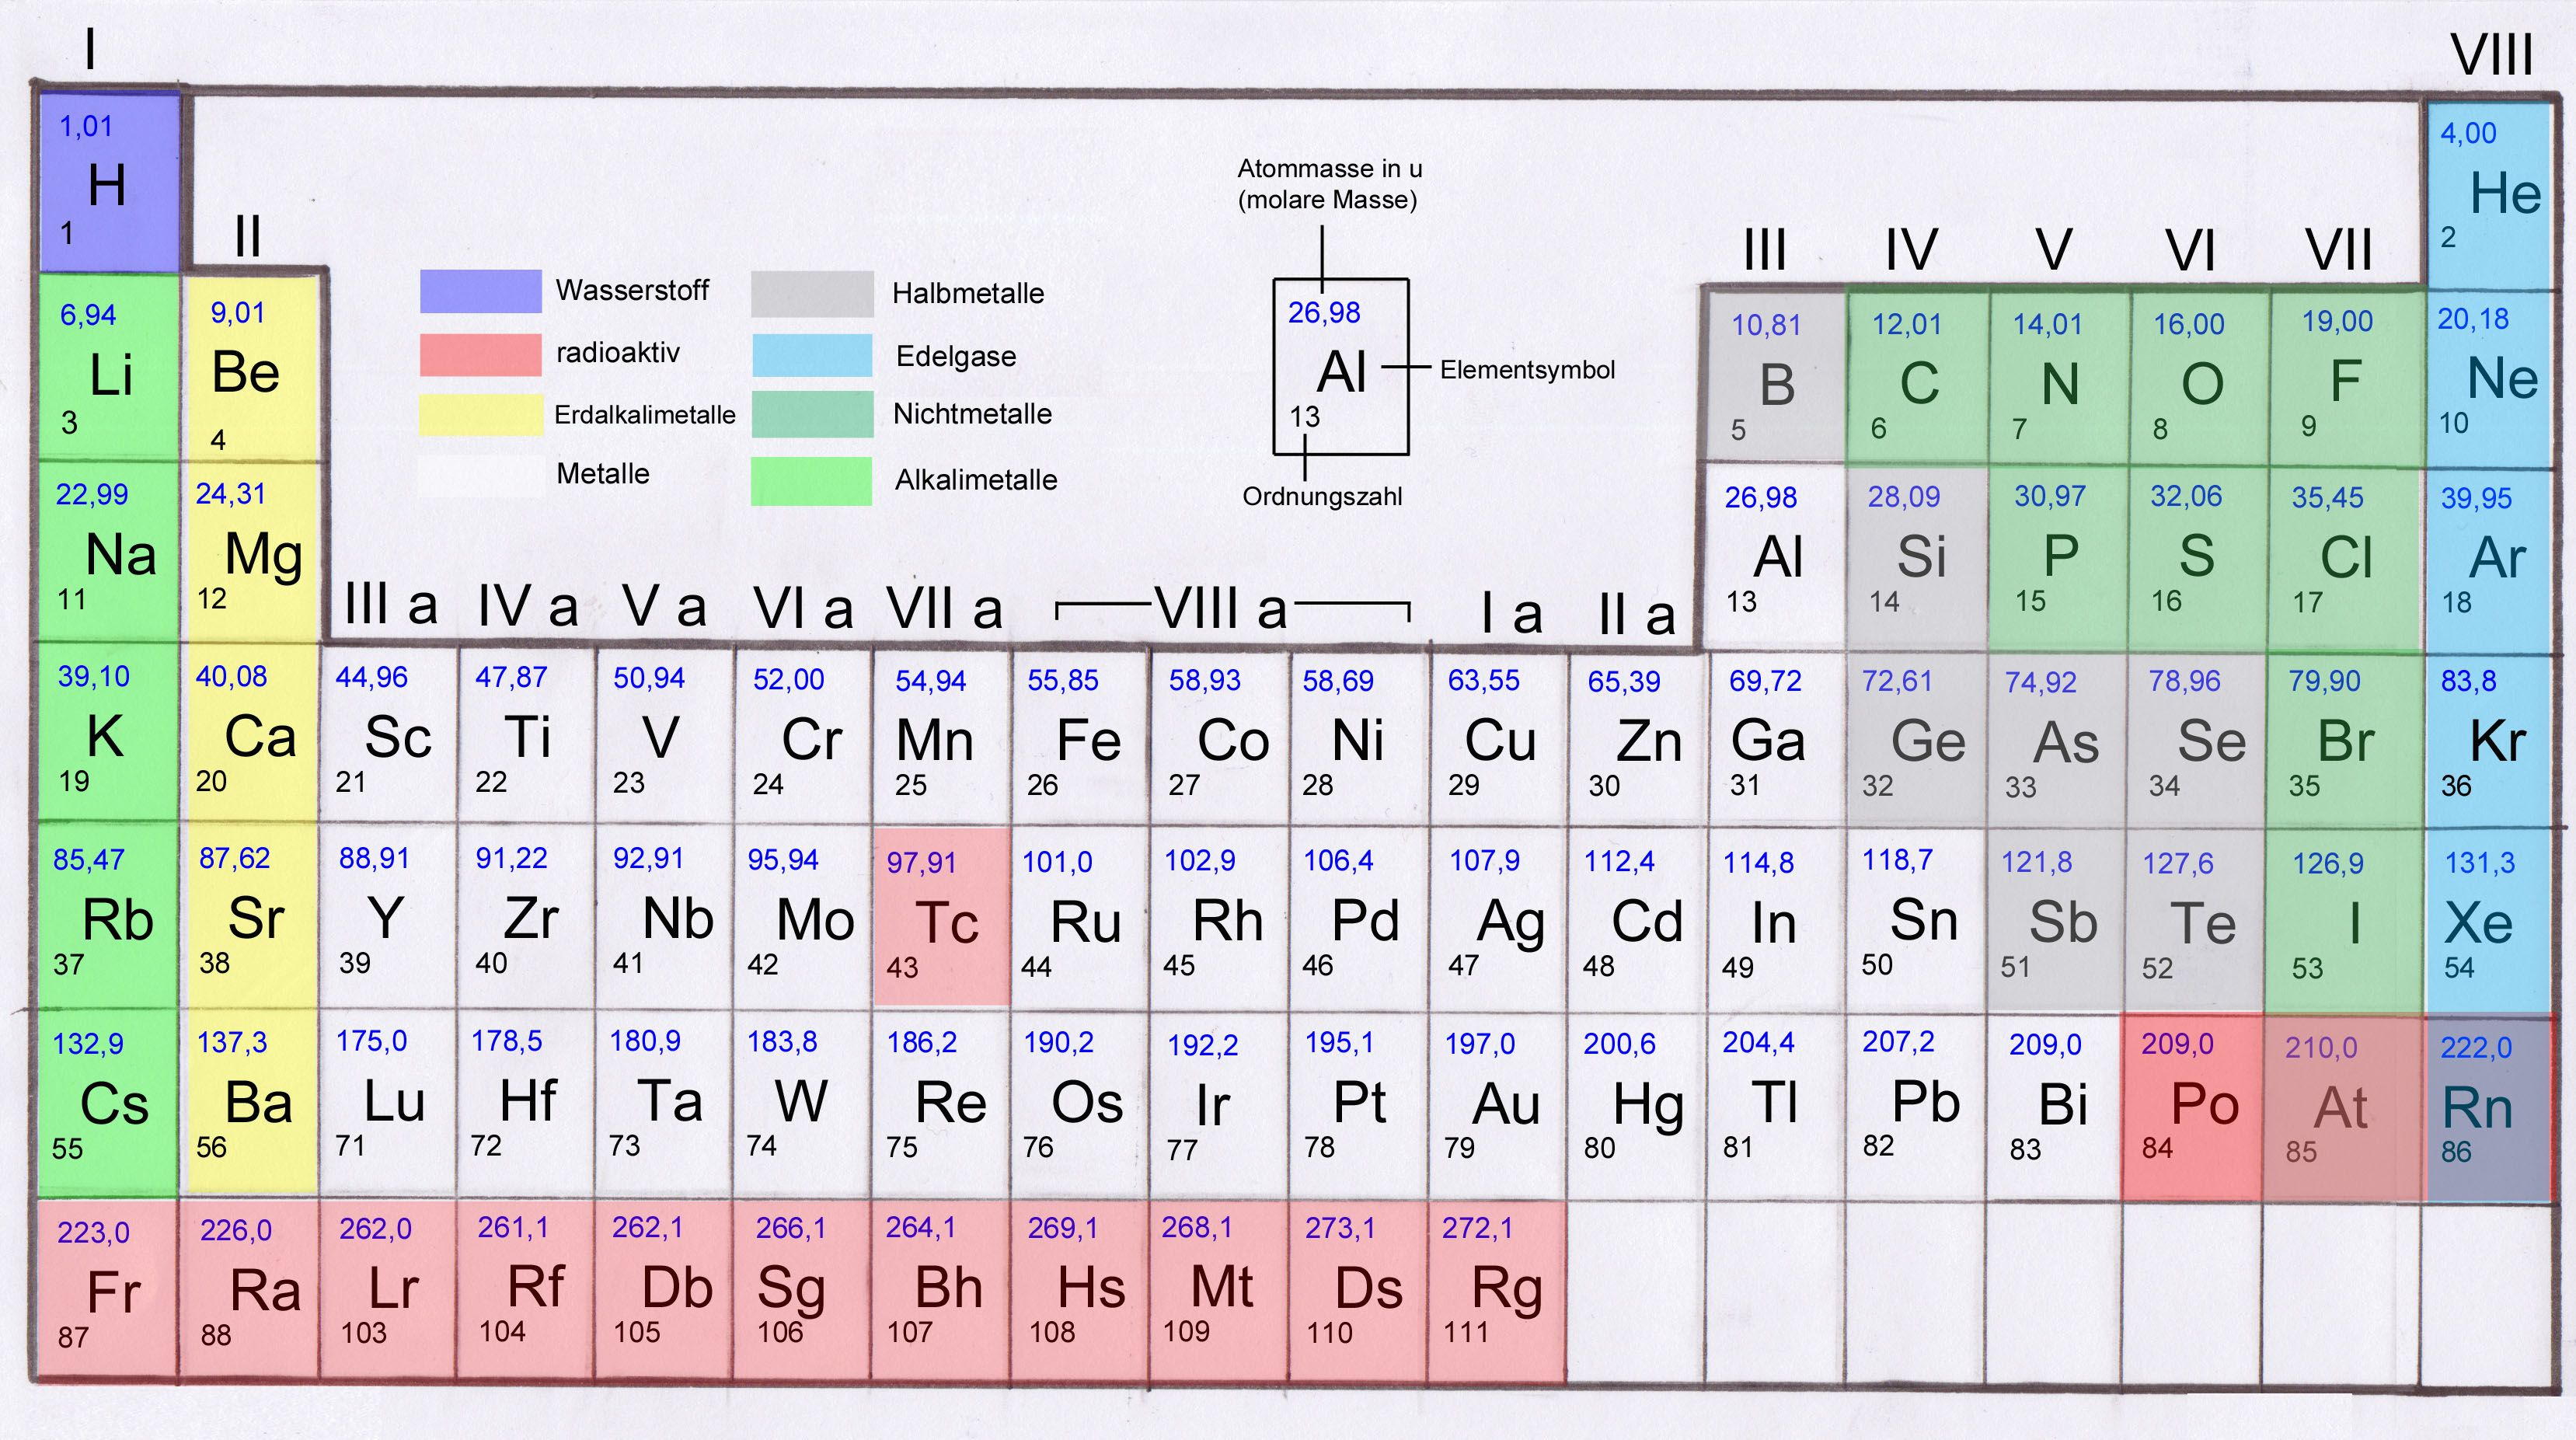 www.frustfrei-lernen.de images chemie periodensystem-gross.jpg ...